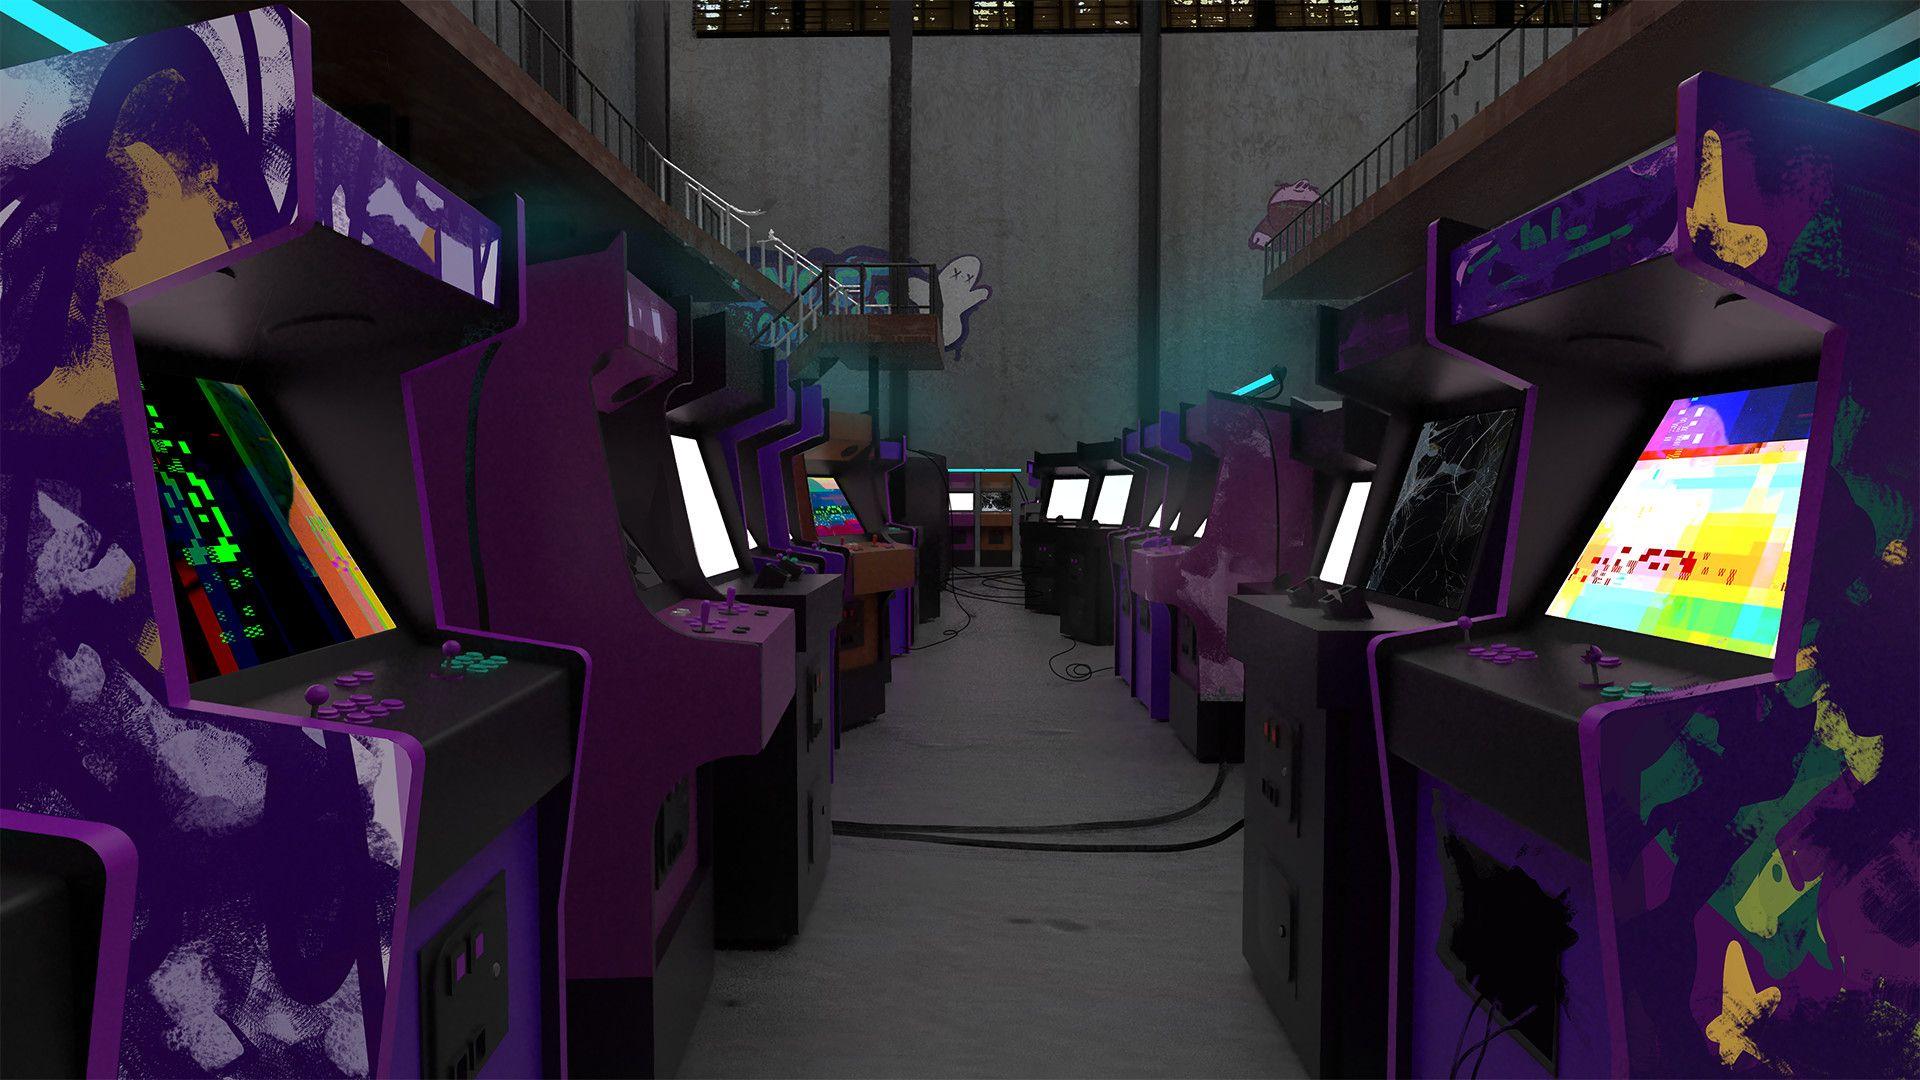 Arcade computer wallpaper